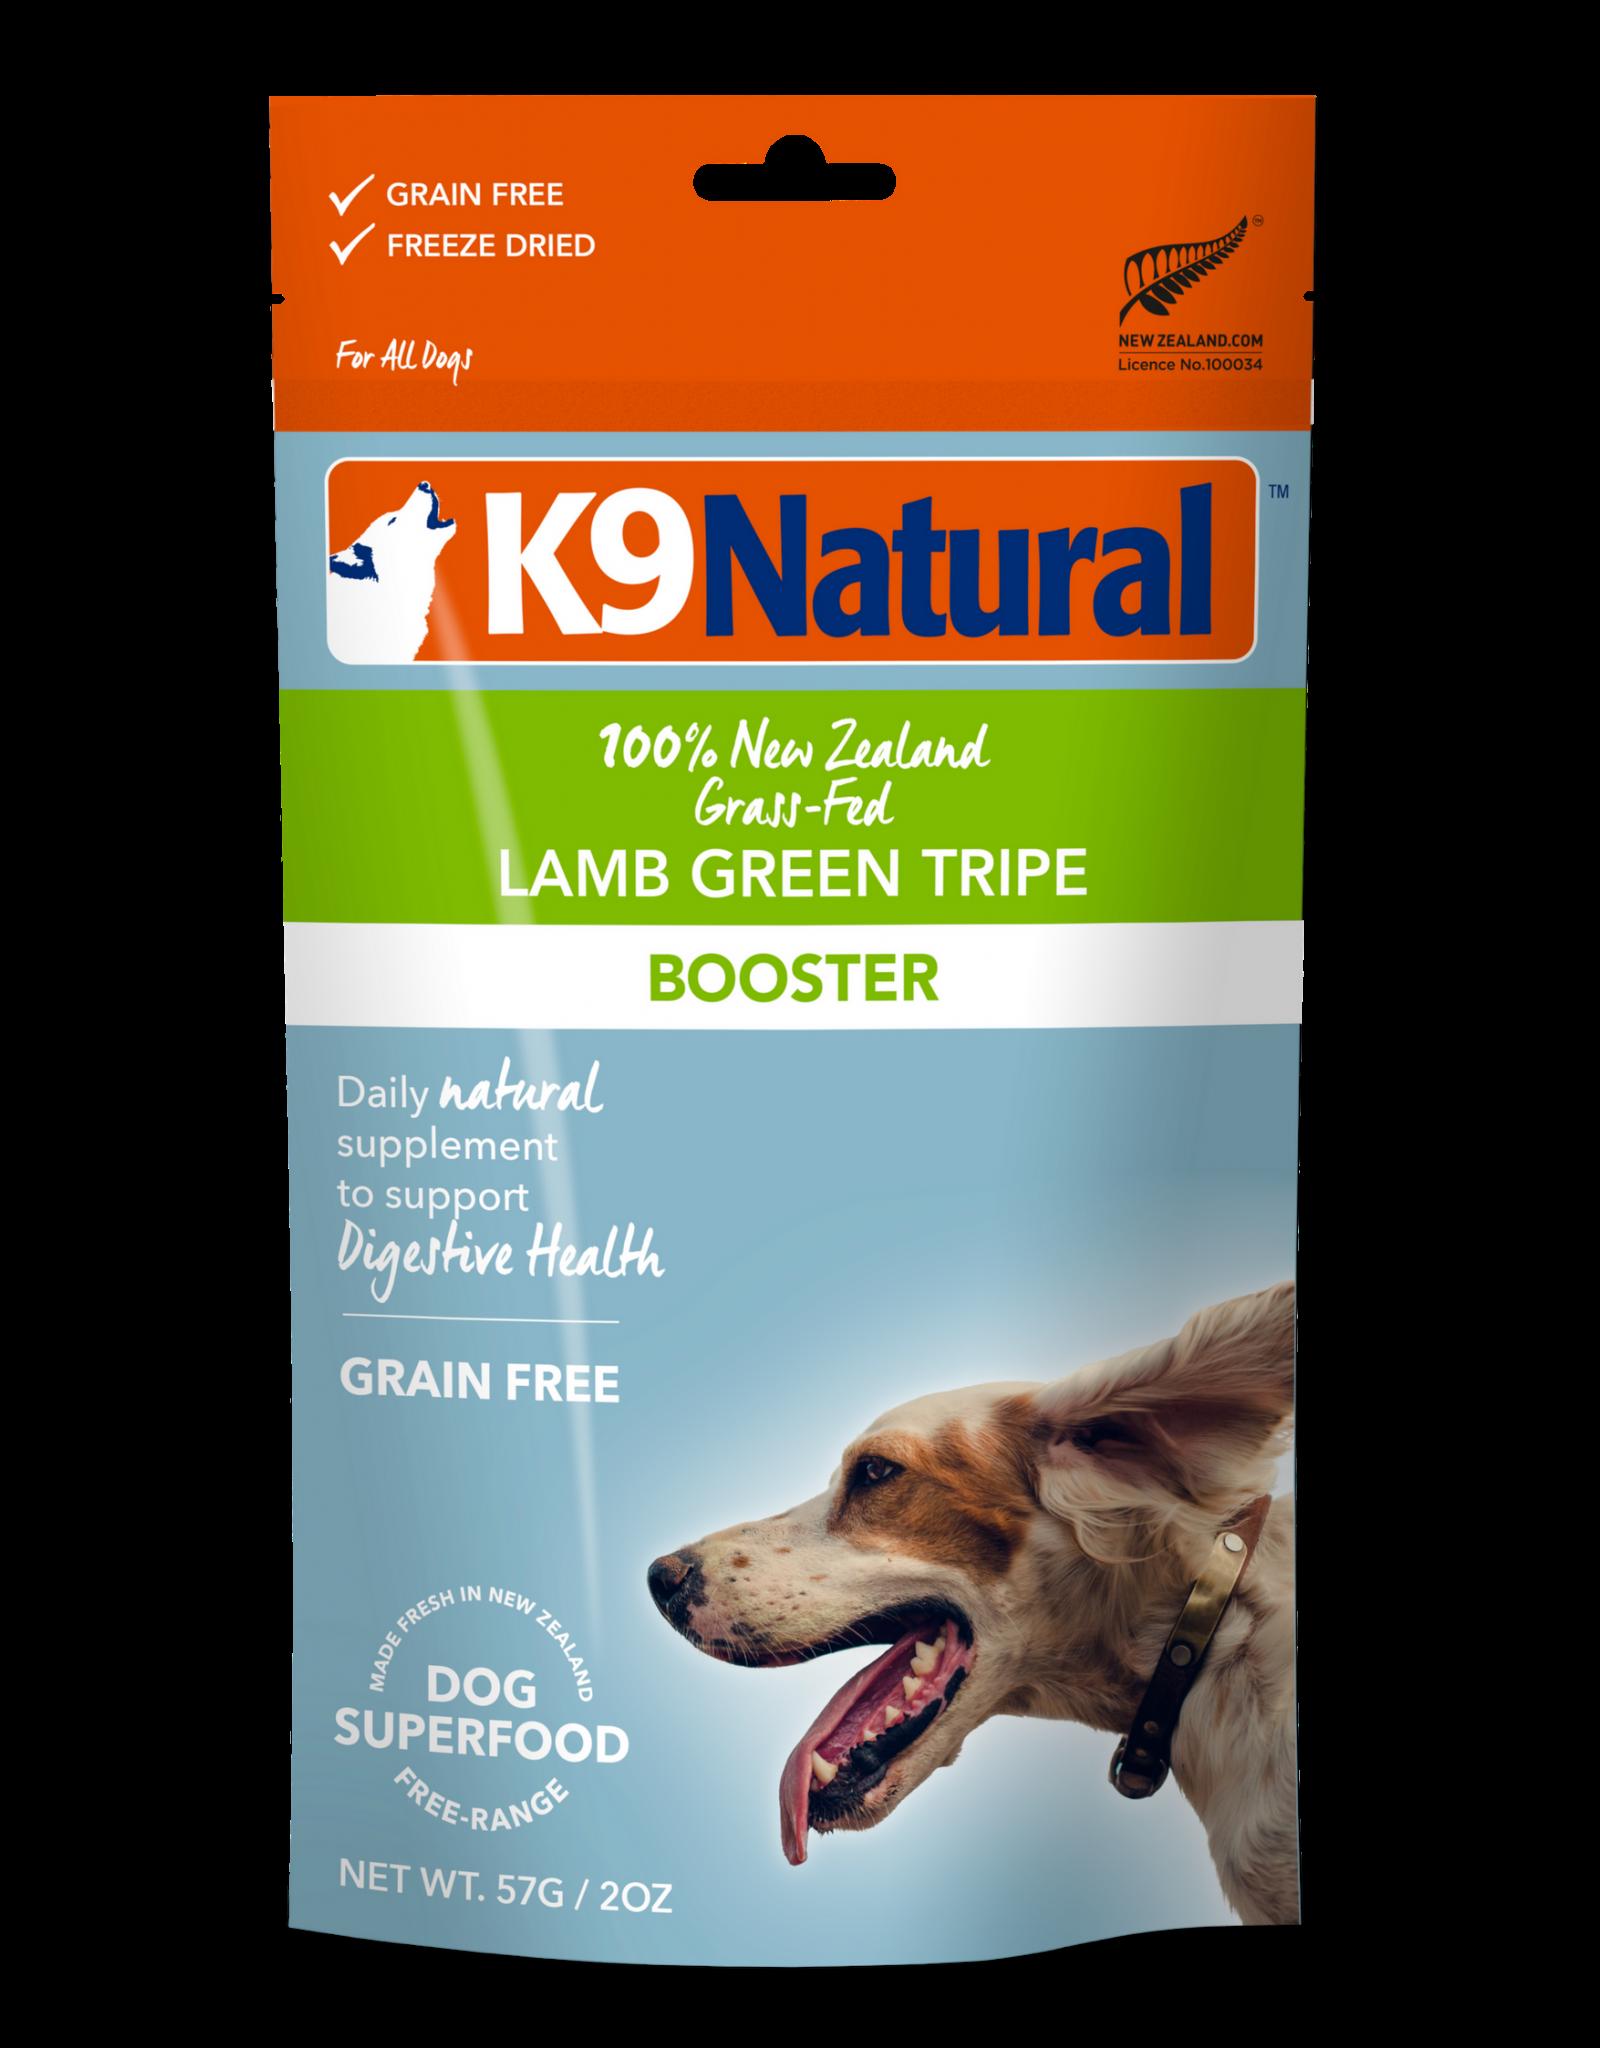 K9 Natural K9 Natural Freeze Dried Lamb Green Tripe Topper 2oz